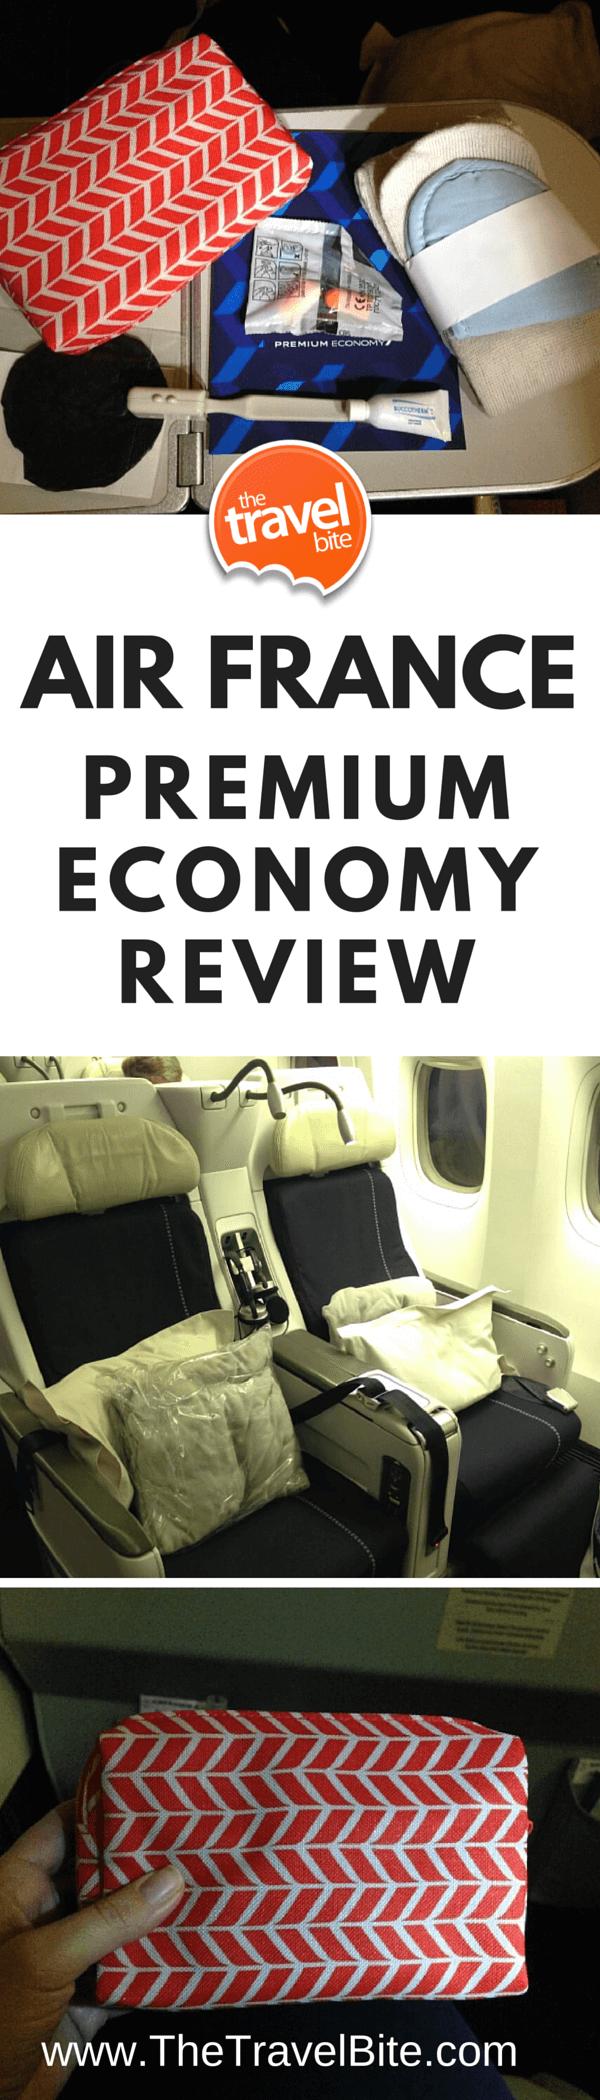 Air France Premium Economy Review-2